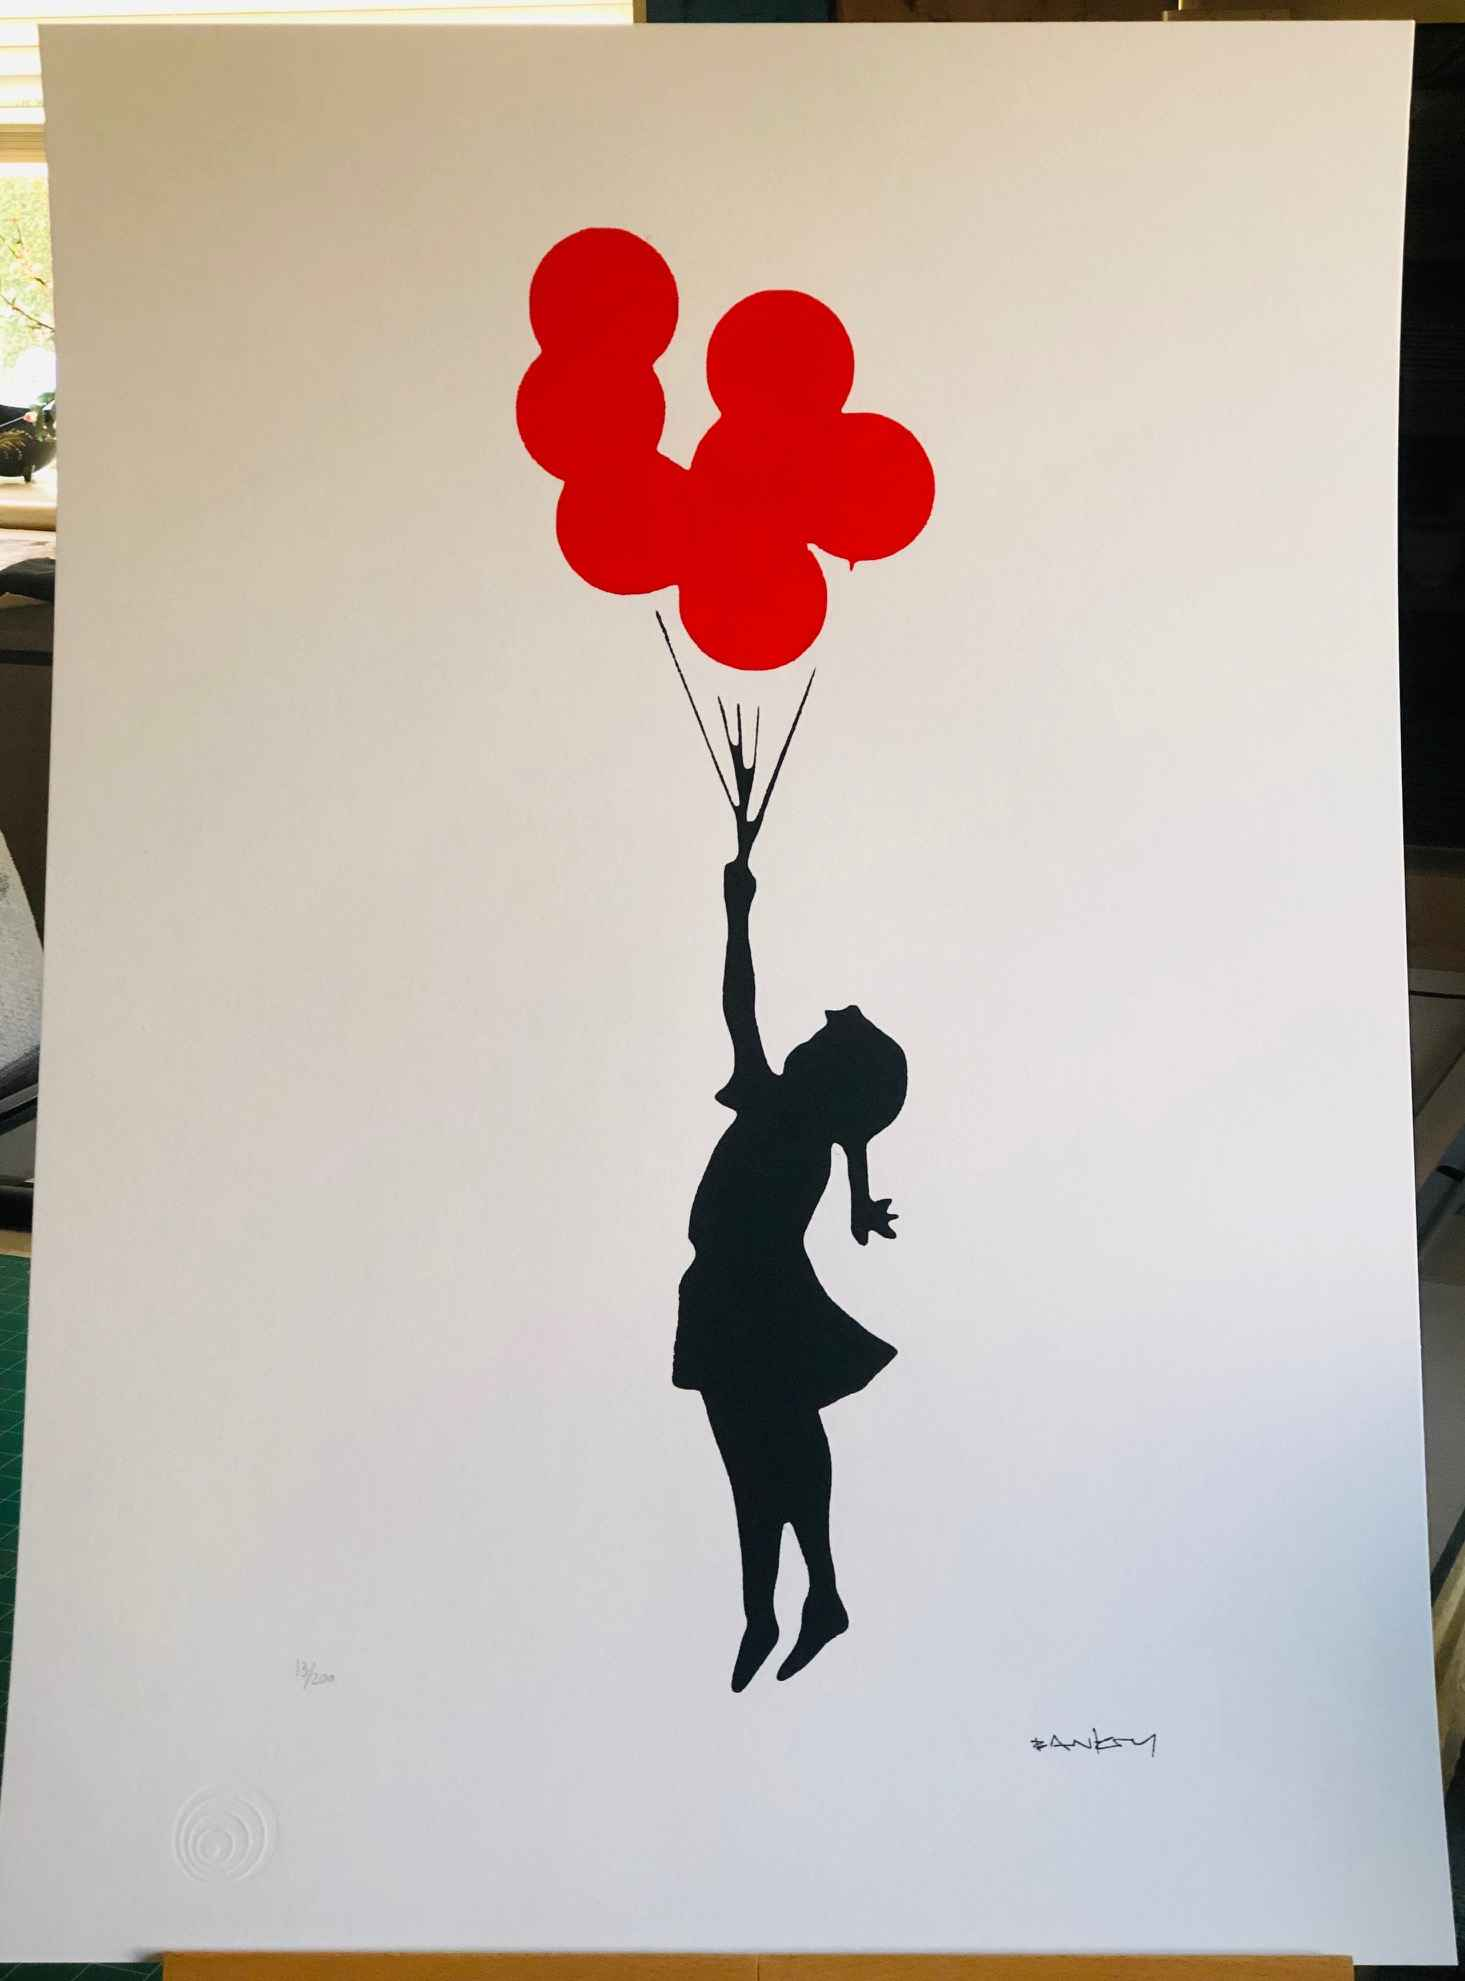 Flying Balloon Girl (...